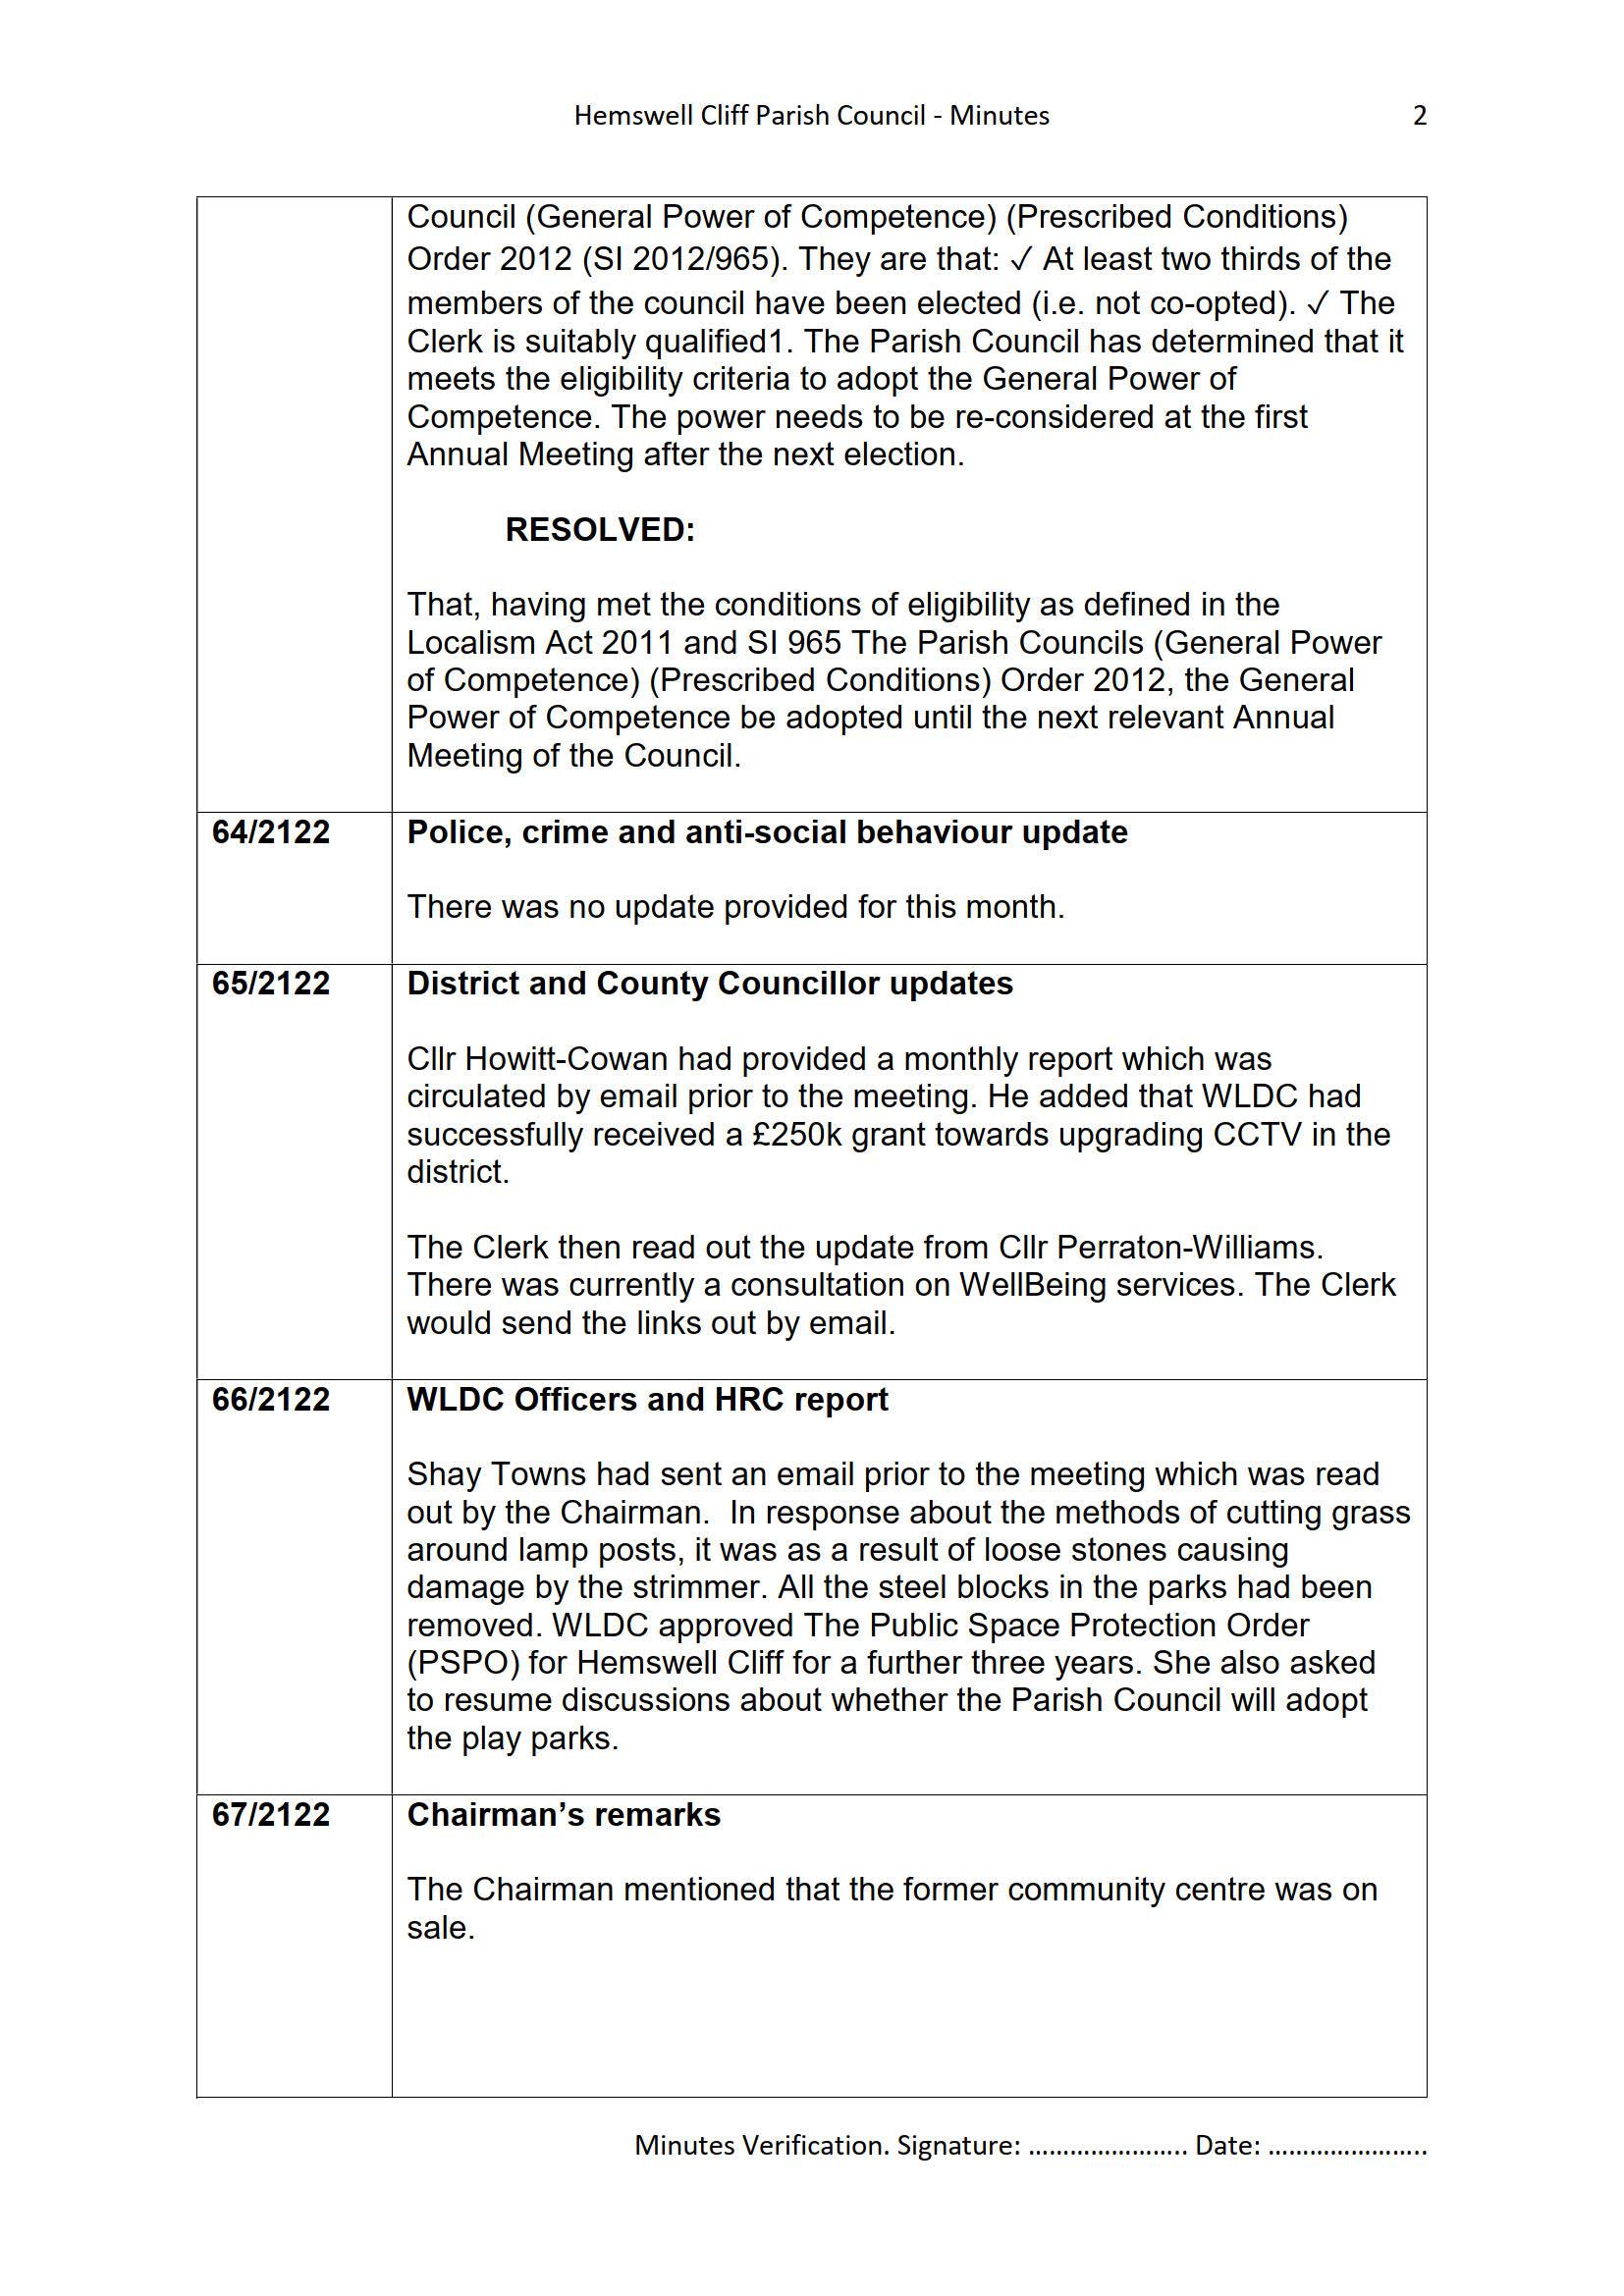 HCPC_Minutes_05.07.21_2.jpg